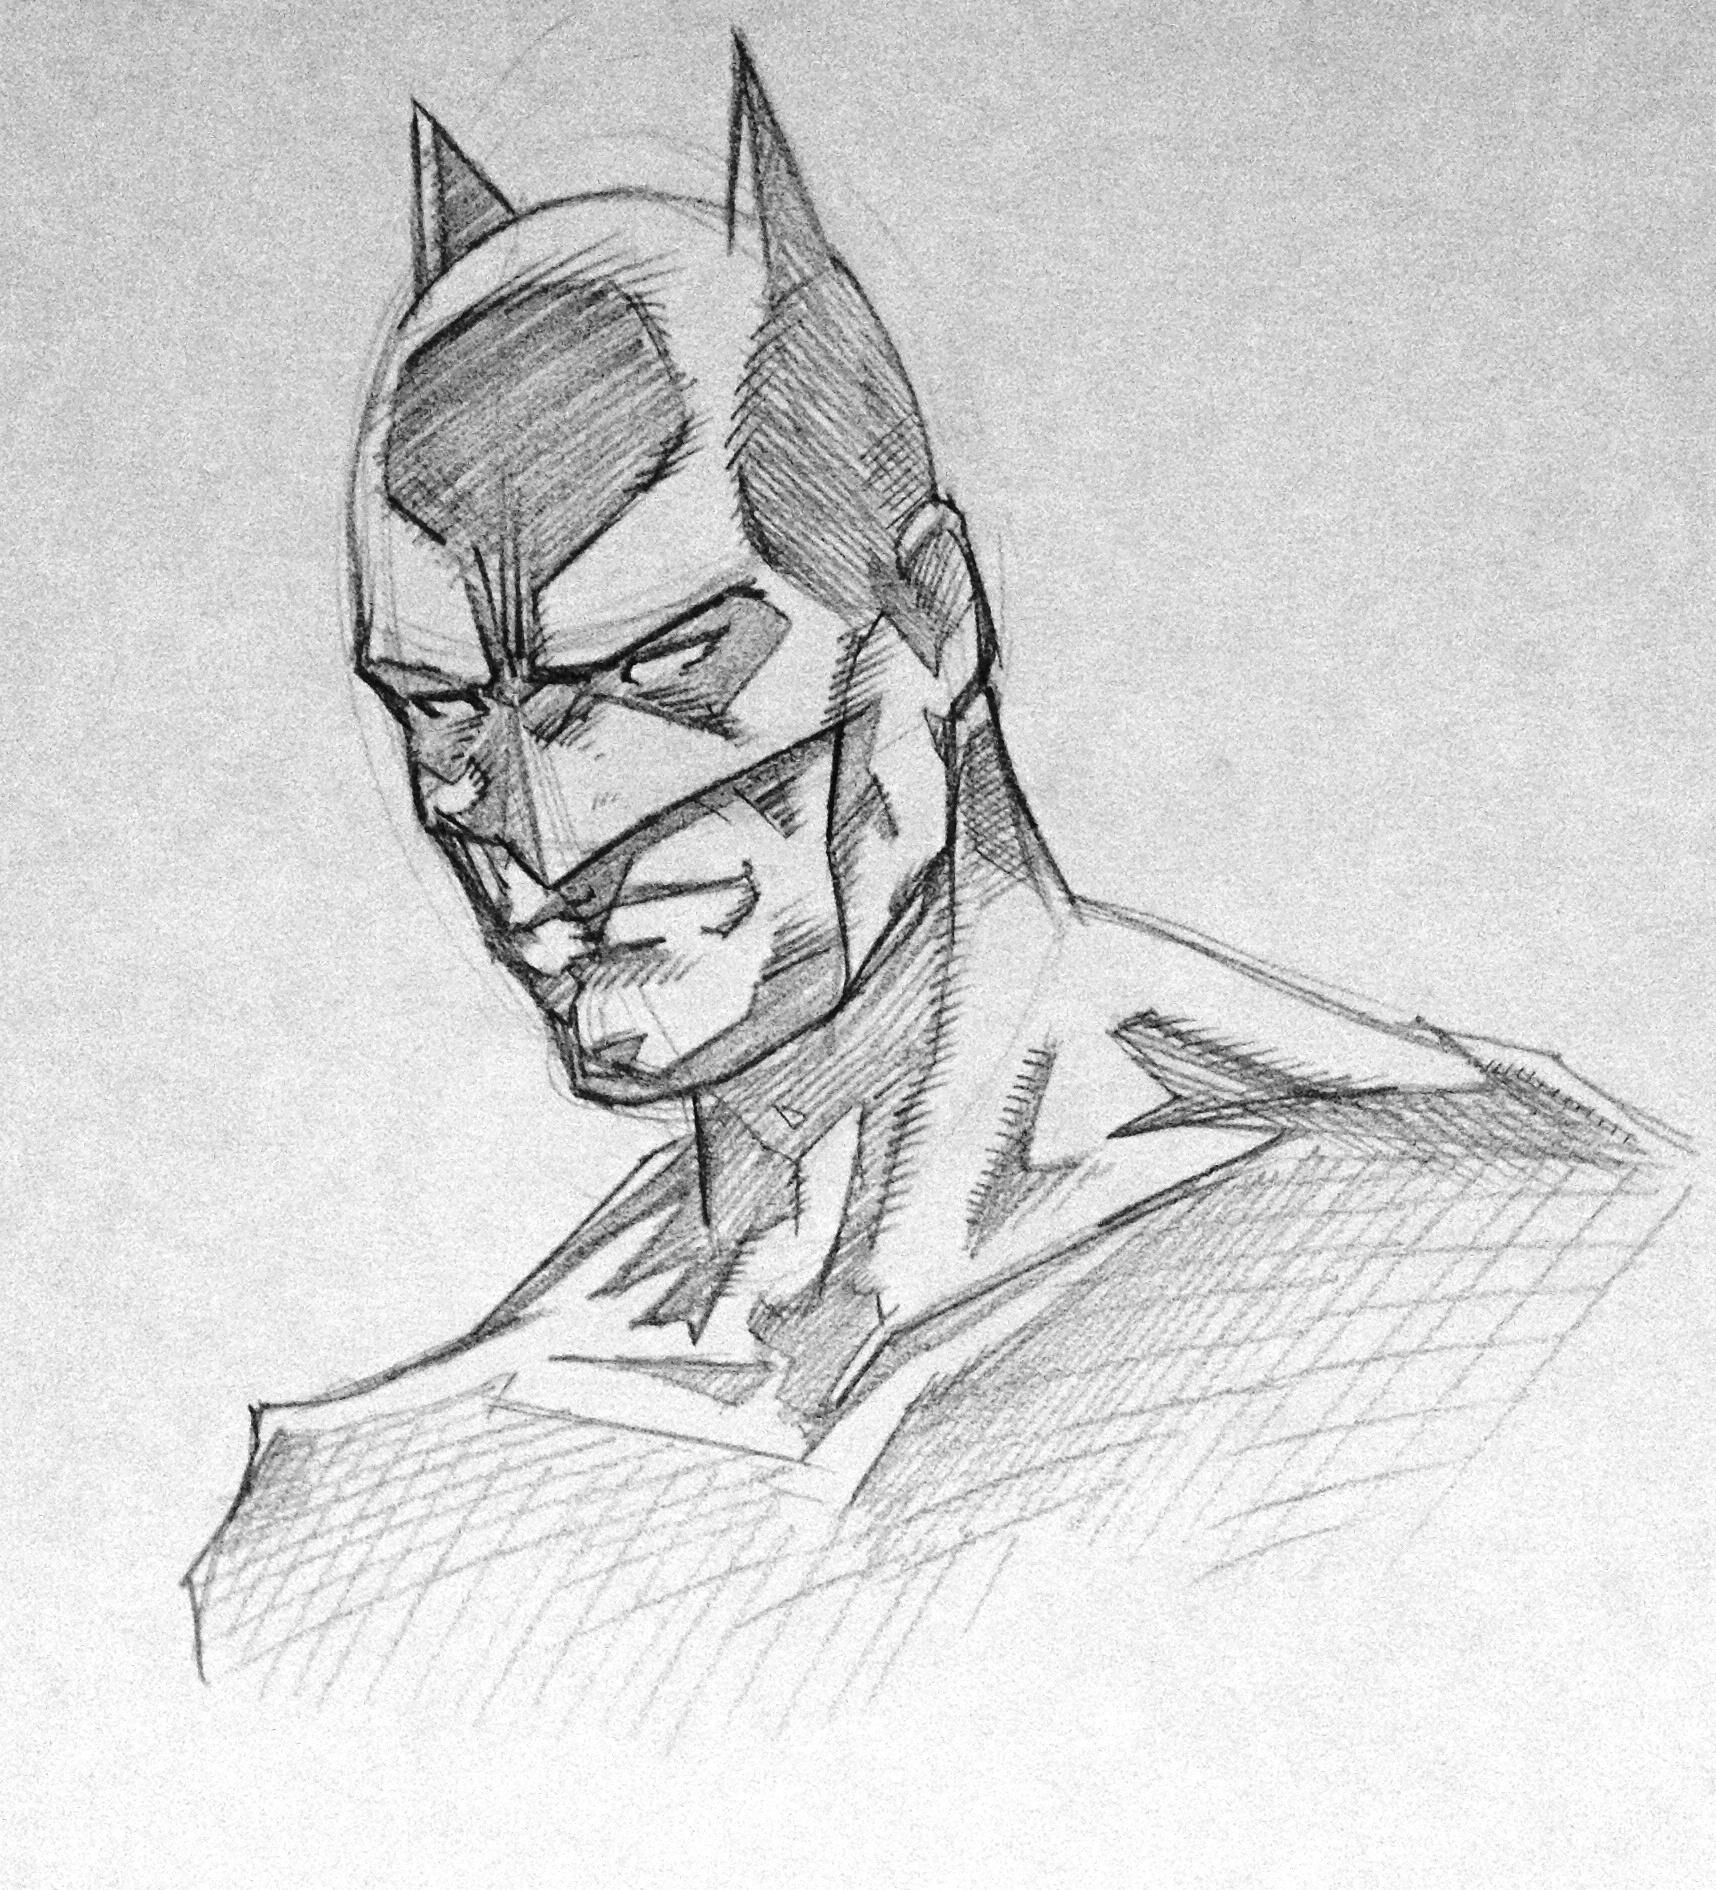 Batman Pencil Sketch by Hopeslast on DeviantArt Batman Drawing In Pencil Easy